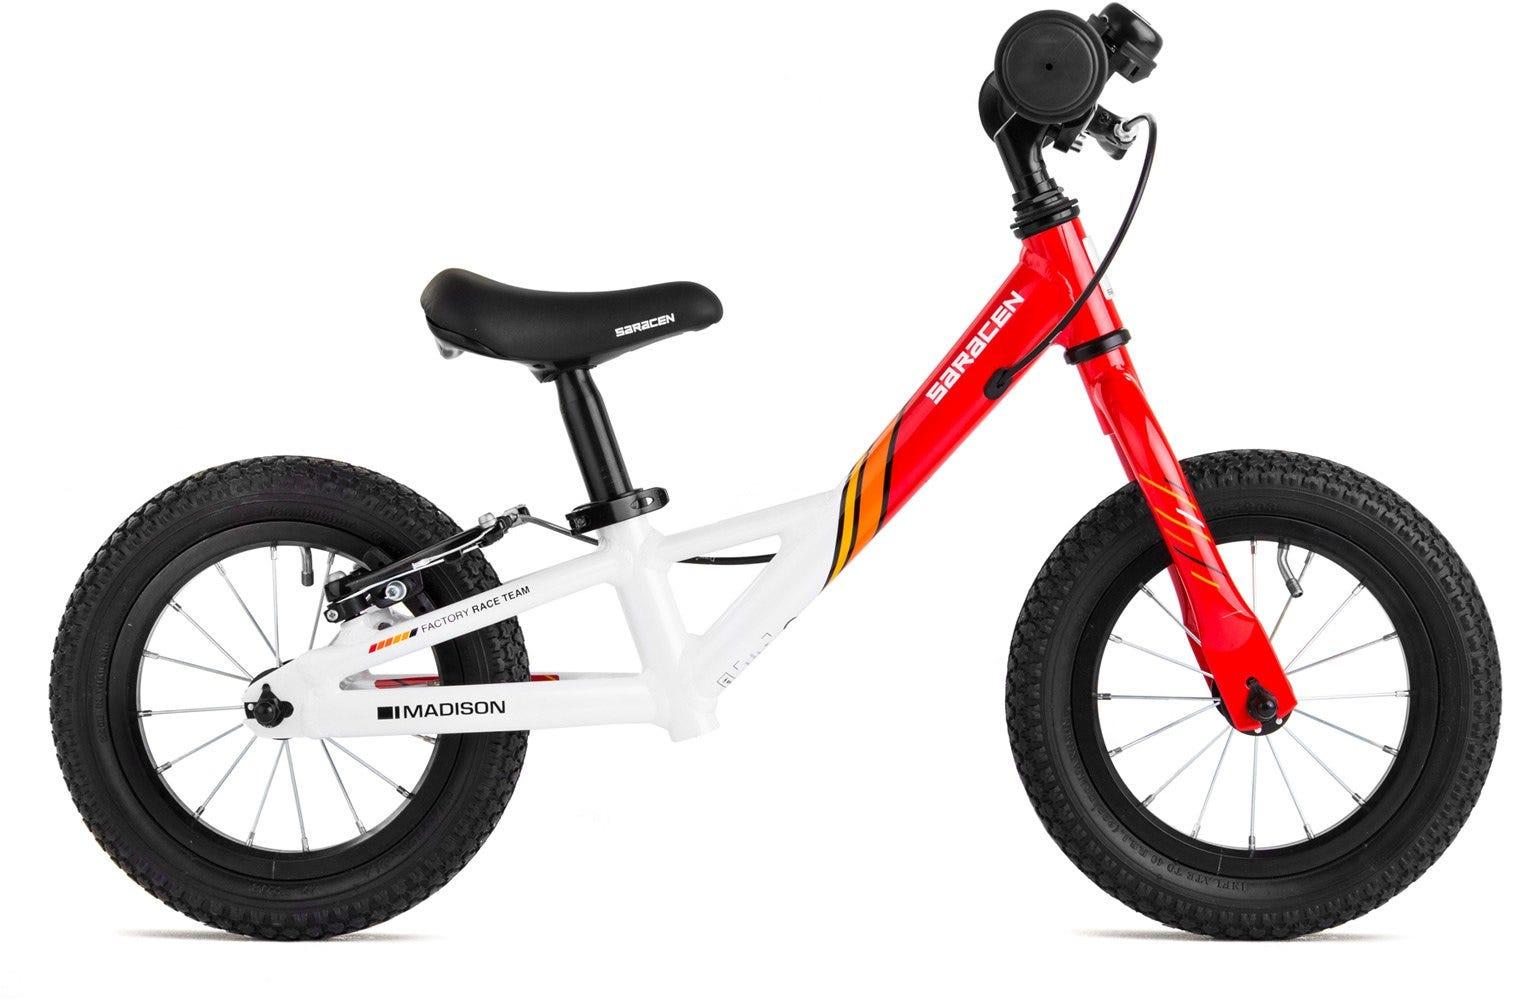 Saracen Freewheel MST bike